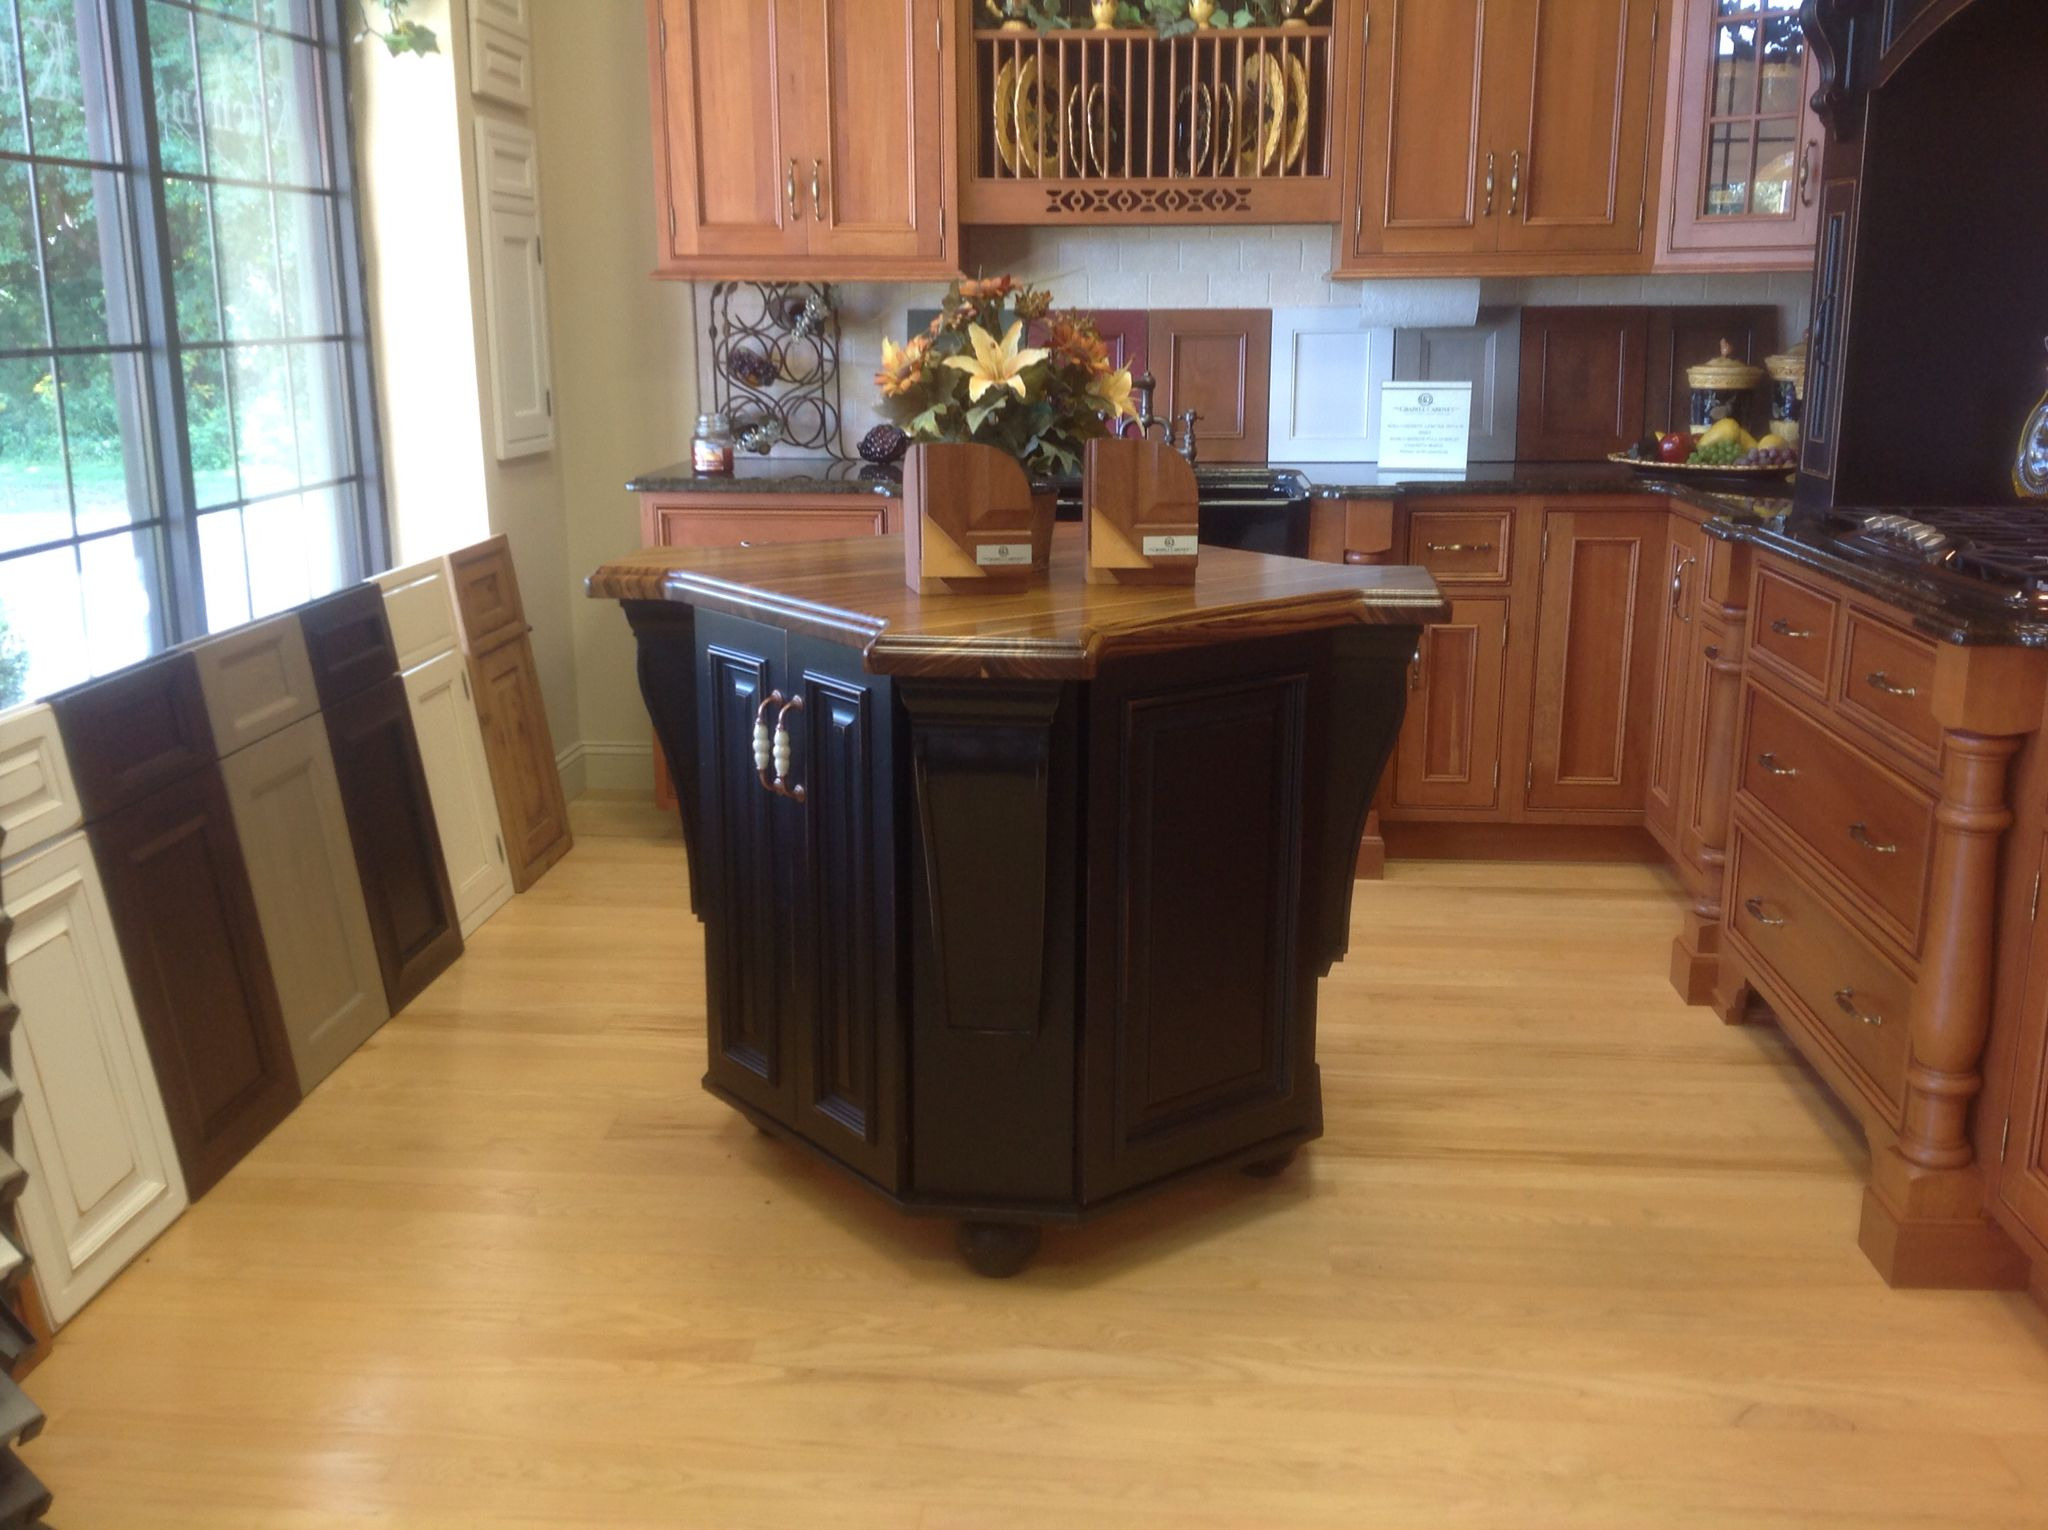 Custom Zebra Top Island Dyer S Cabinet Shop Is Having A Display Sale This Black Medallion Cabinet With Distress Medallion Cabinets Zebra Wood Custom Kitchen